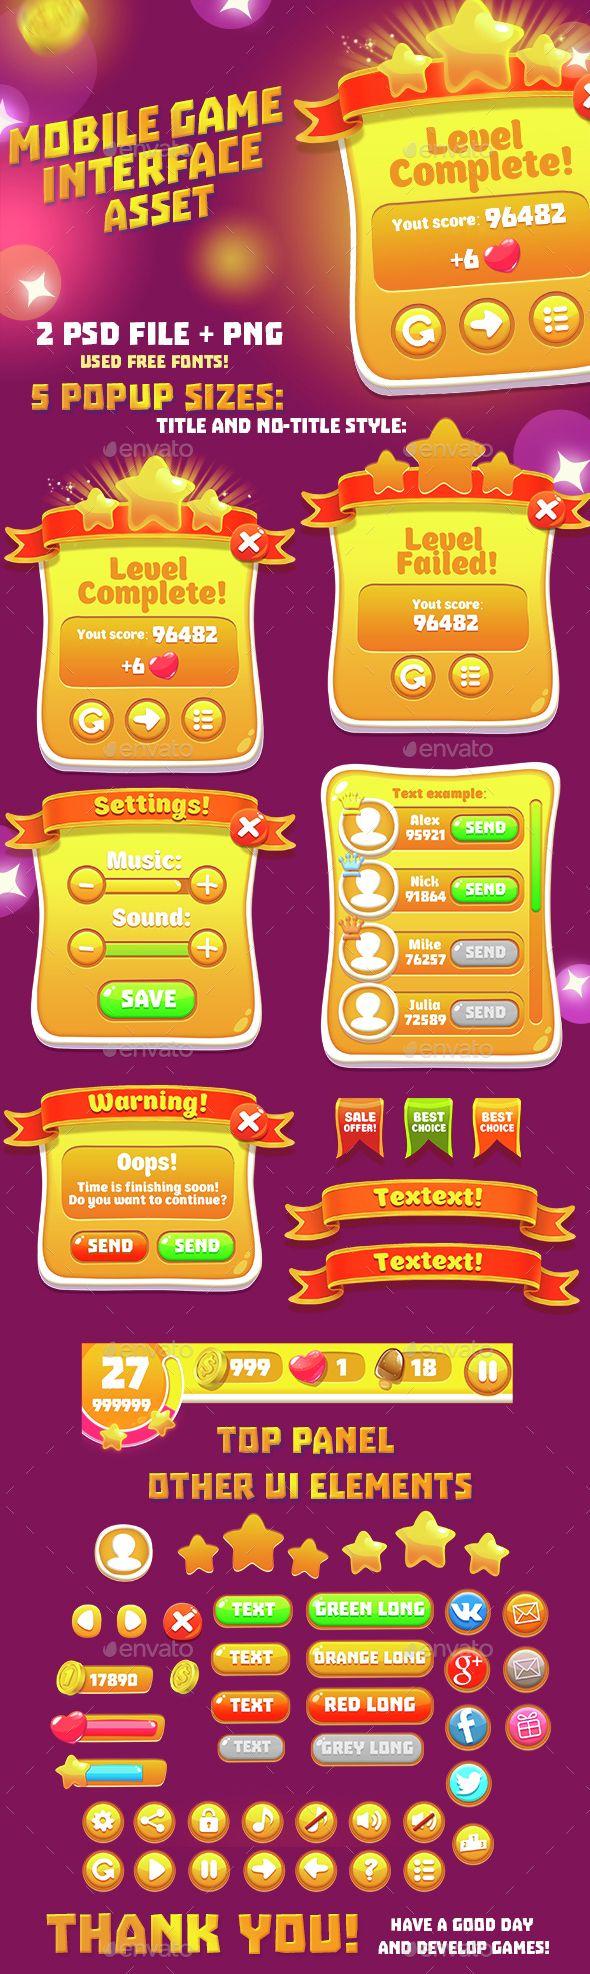 Orange Casual GUI Set - User Interfaces Game Assets | Download http://graphicriver.net/item/orange-casual-gui-set/15082858?ref=sinzo